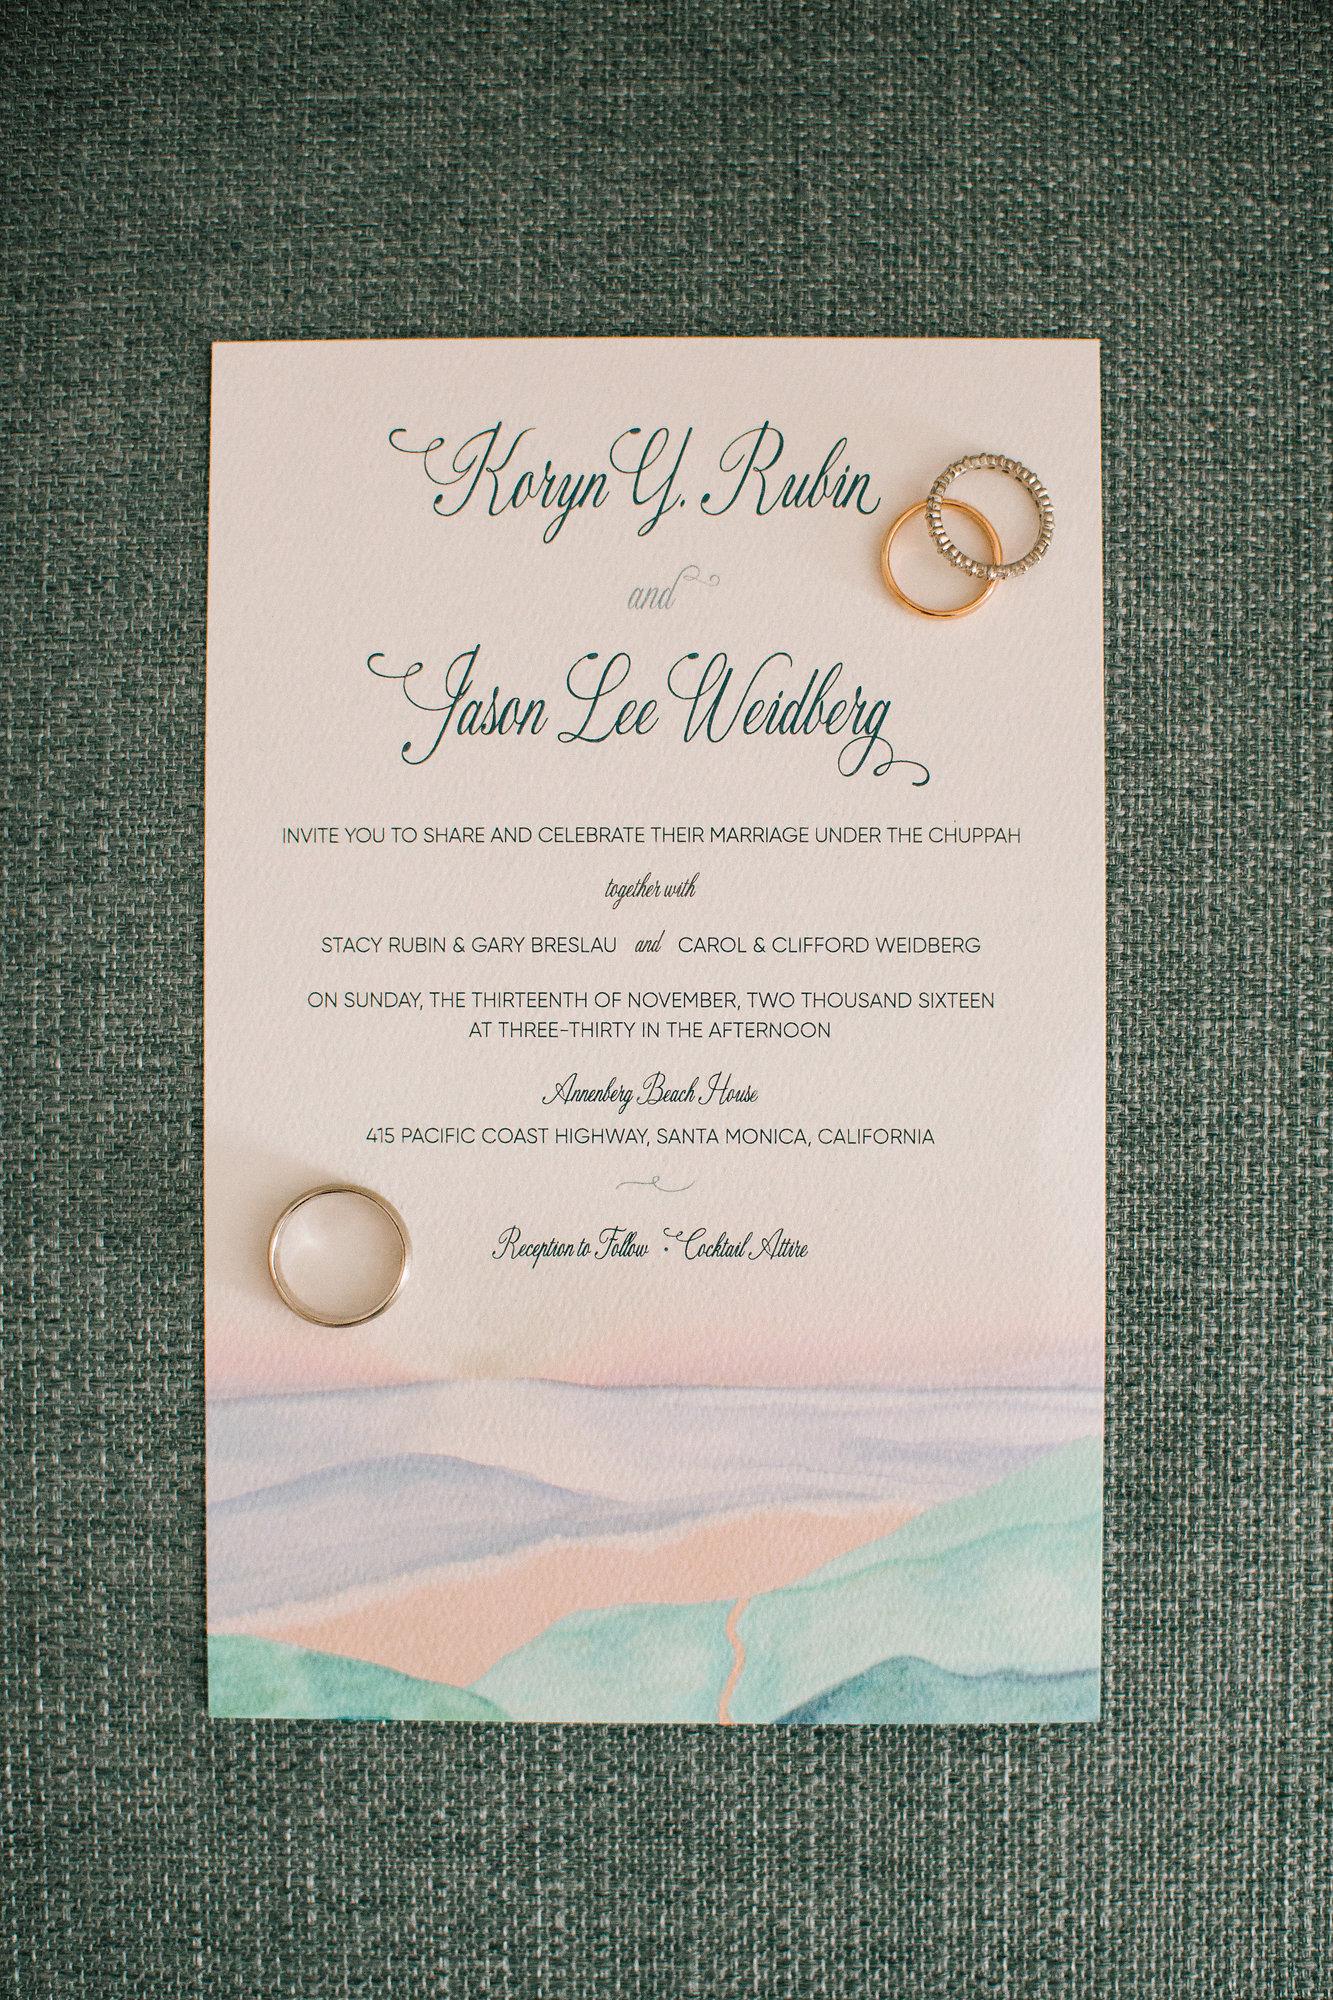 Type-A-Invitations-Koryn-Jason-Jewish-Wedding-California-Beaux-Arts-Photographie-Nov-2016-07-147.jpg